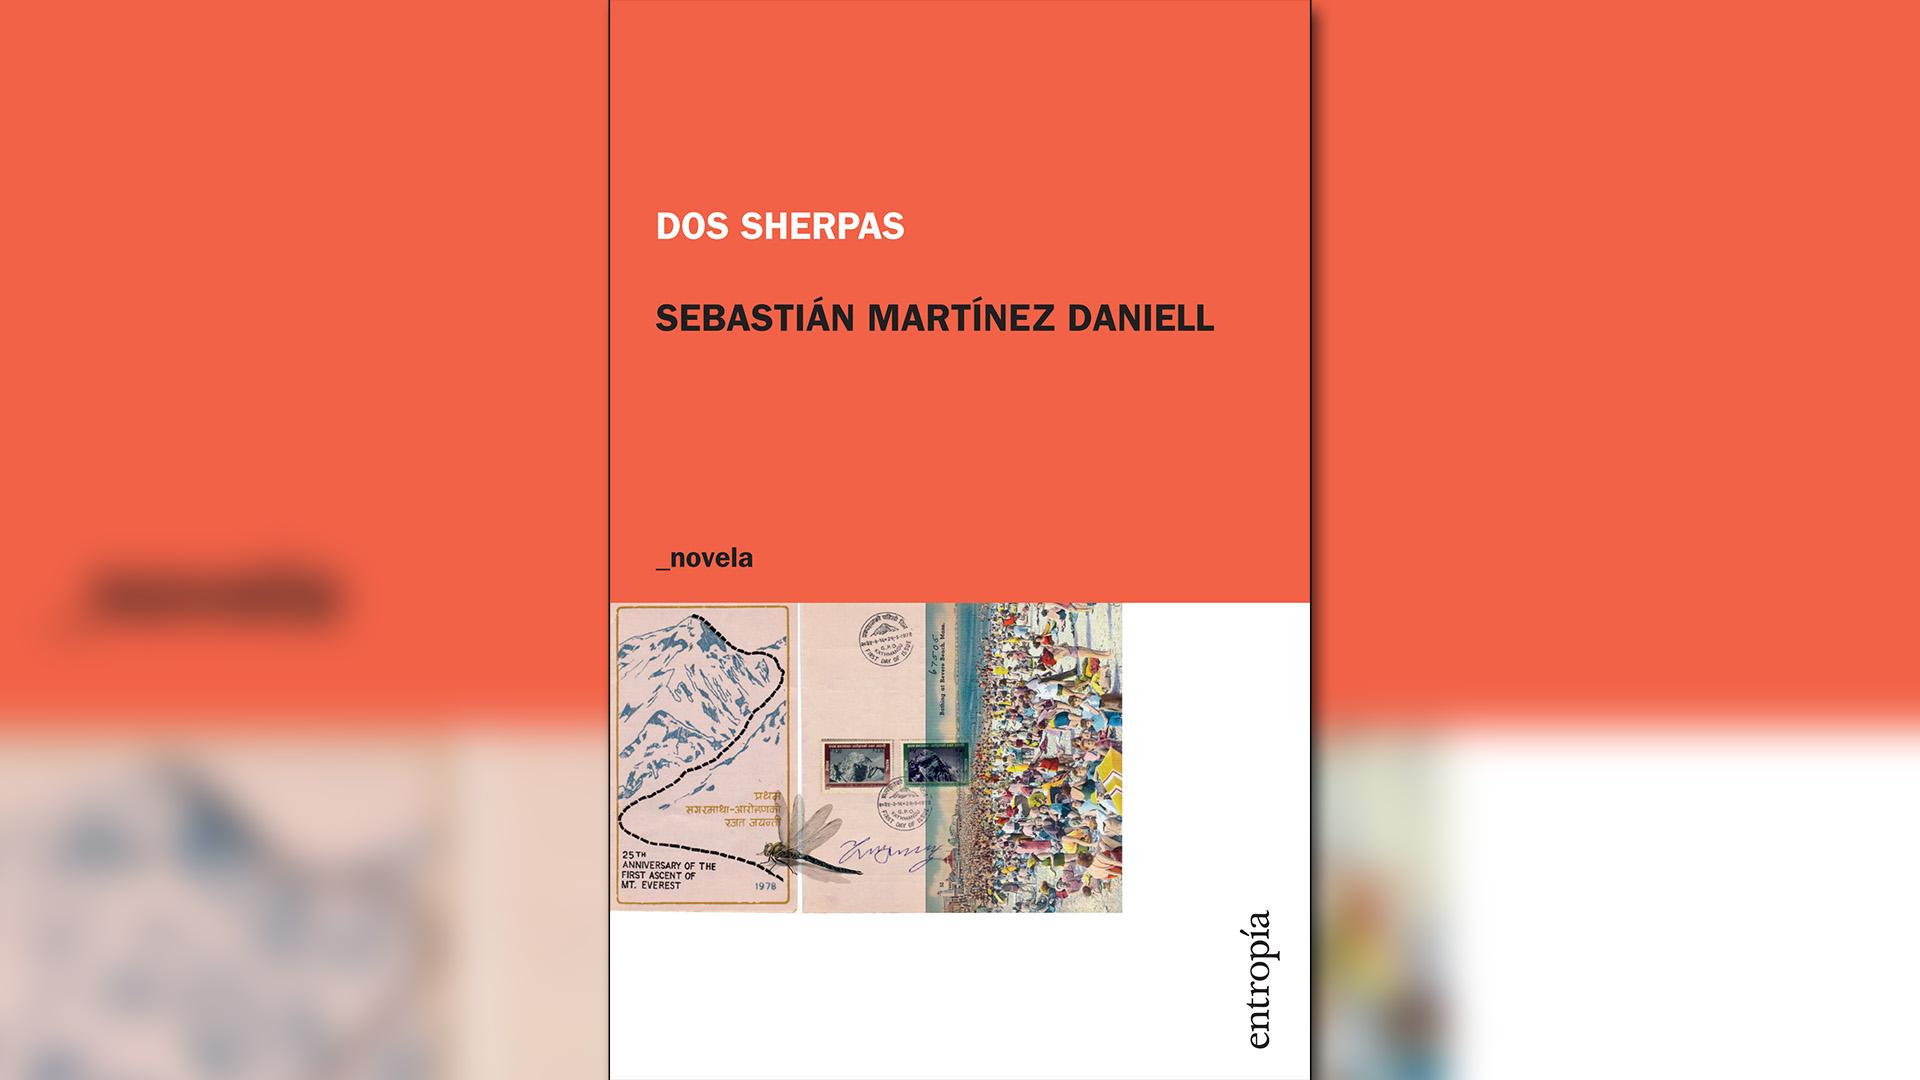 Dos sherpas fue editada por Entropía